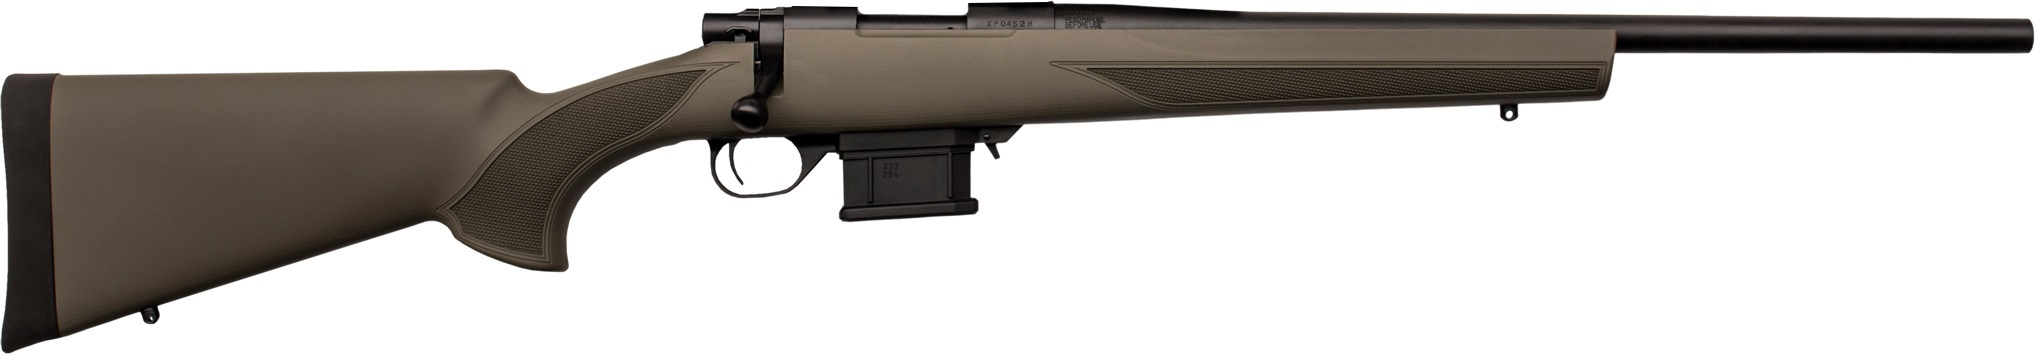 HOWA M1500 Mini Action 450 Bushmaster